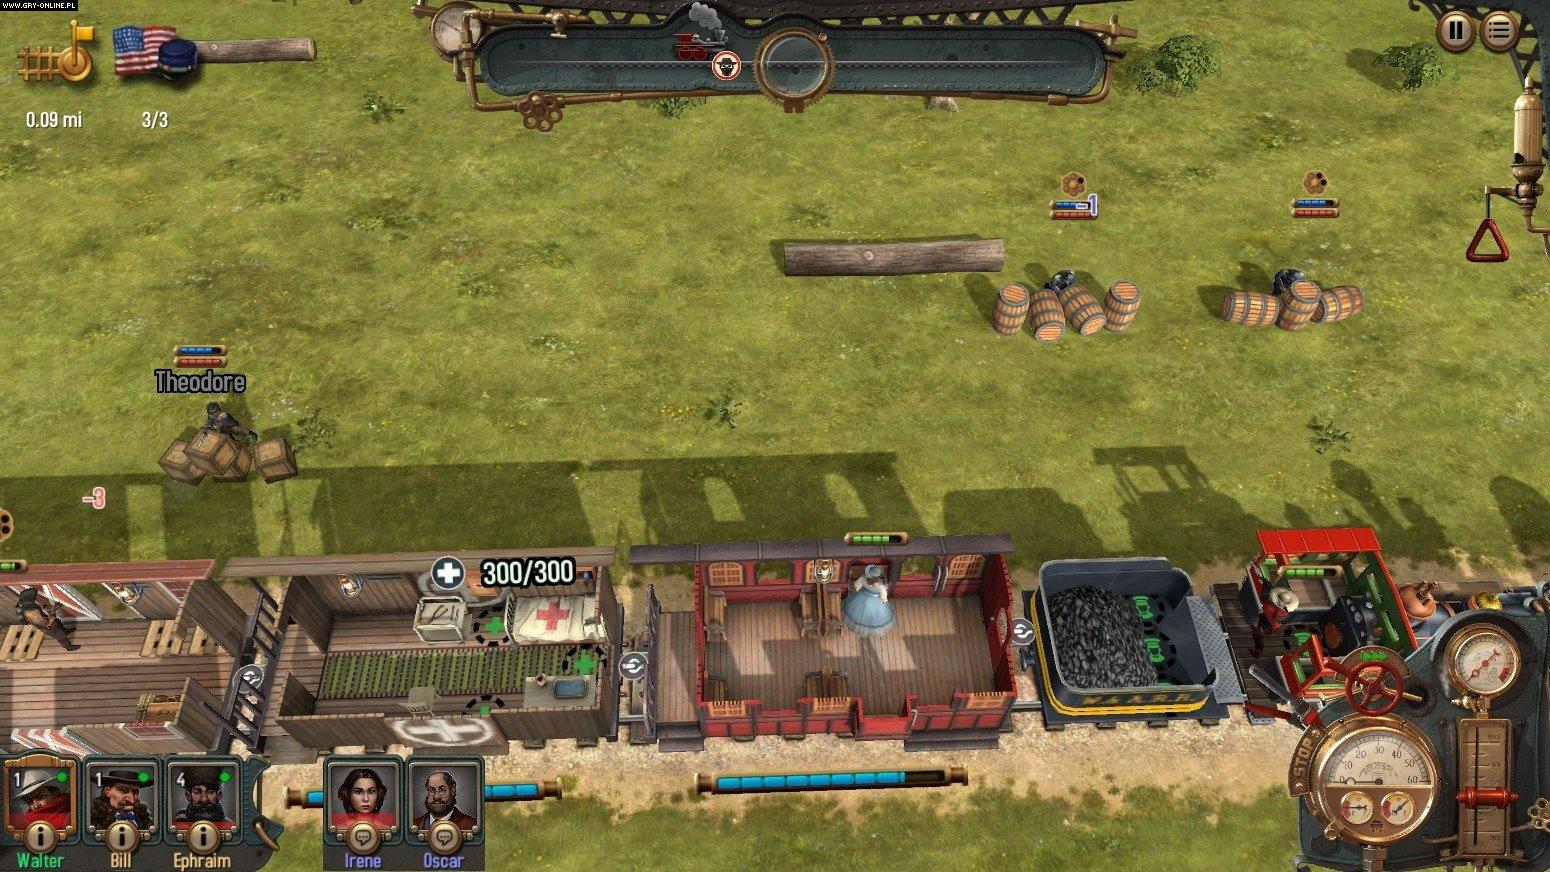 Bounty Train PC Games Image 9/26, Corbie Games, Daedalic Entertainment